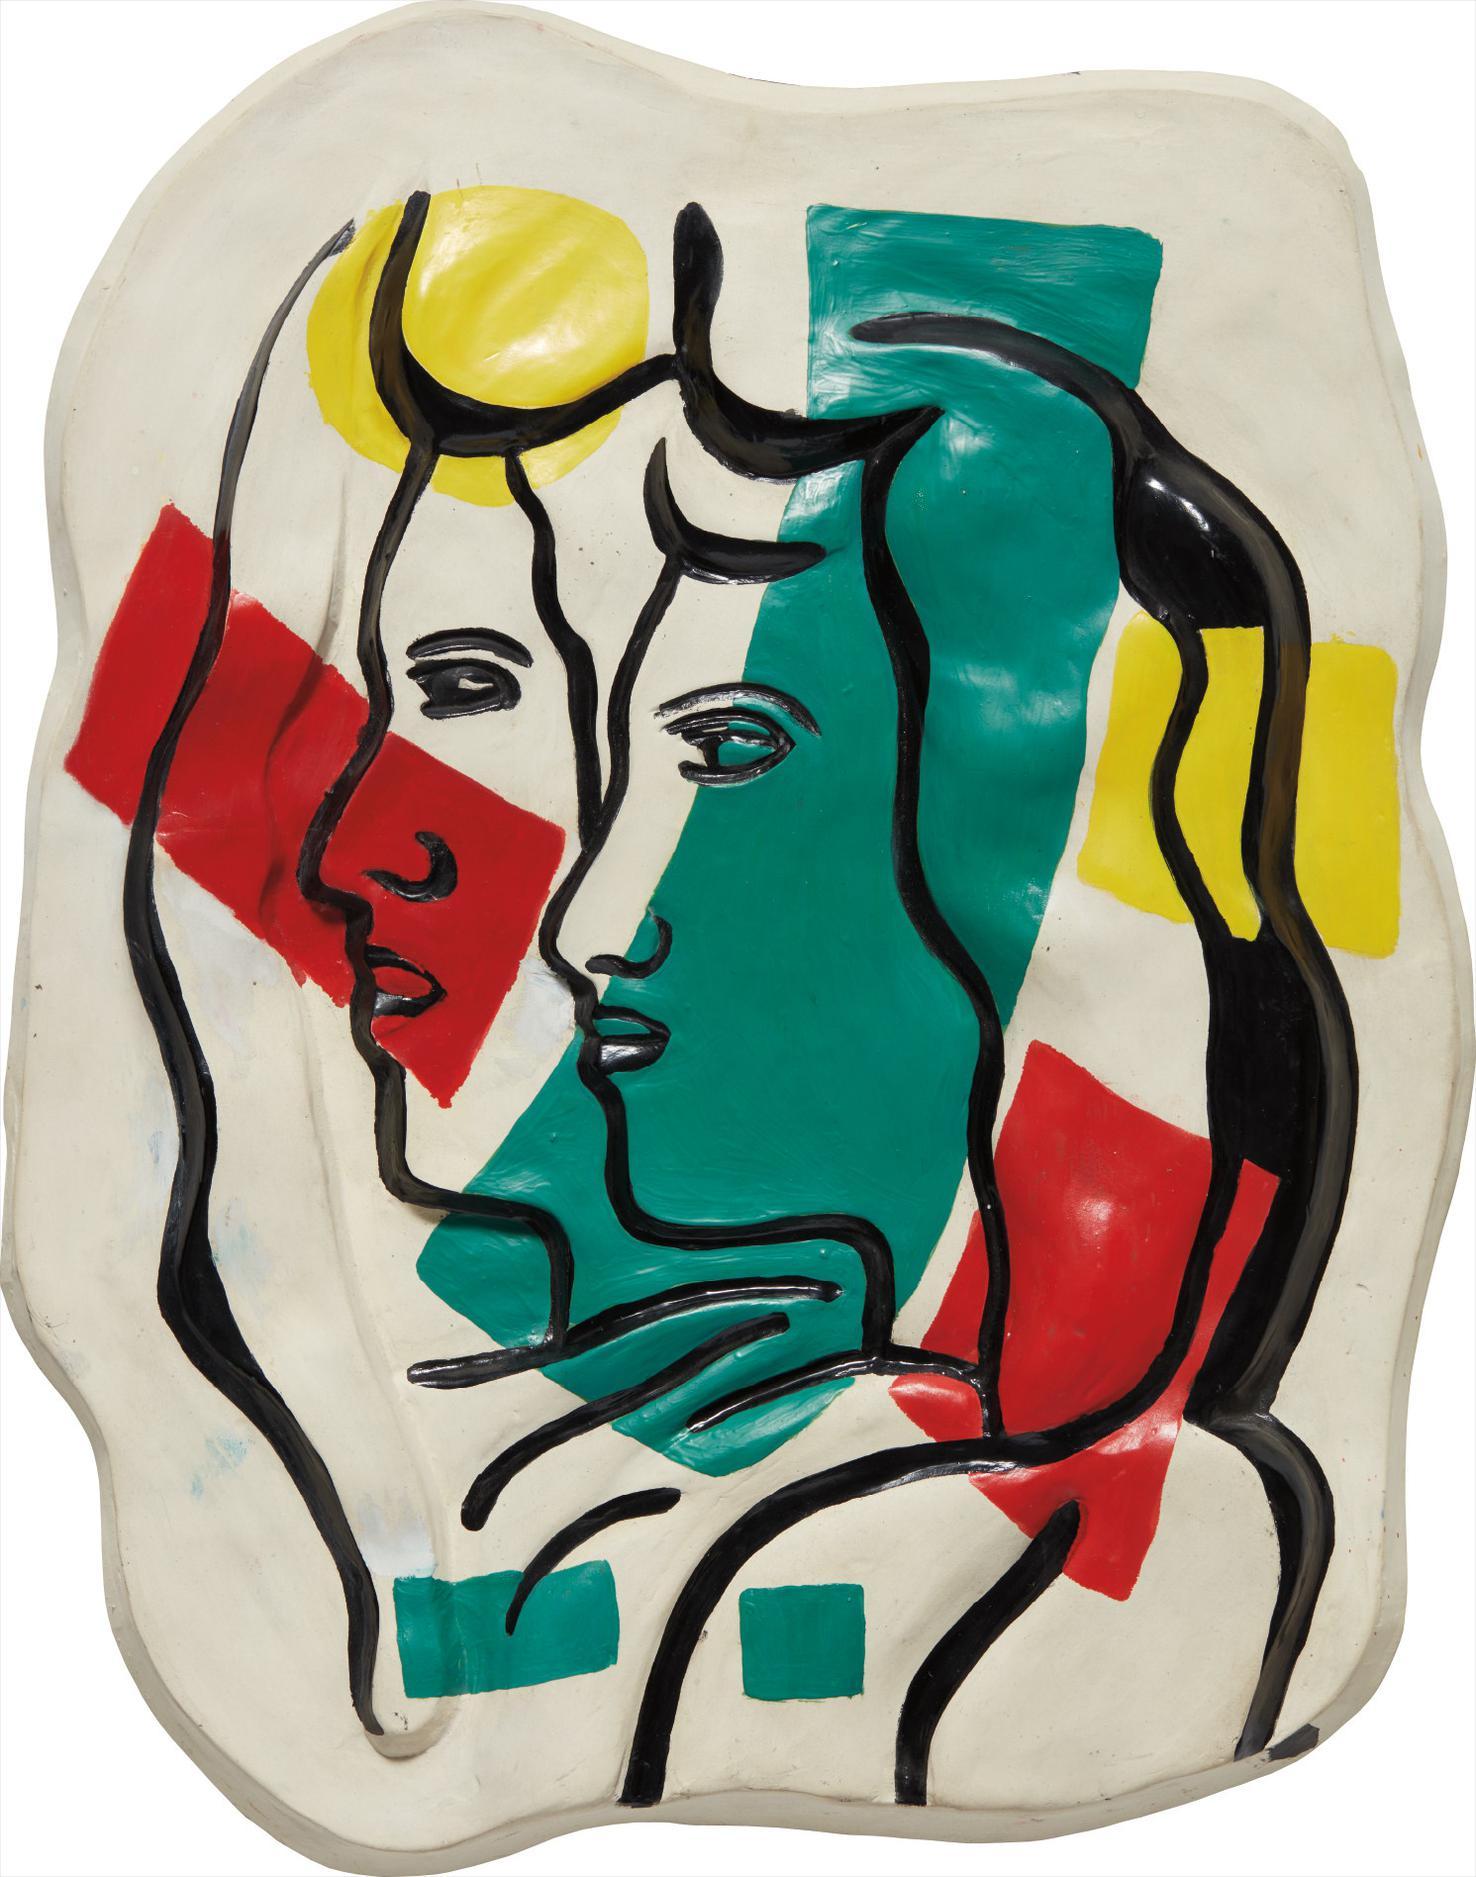 Fernand Leger-Les Deux Profils-1952